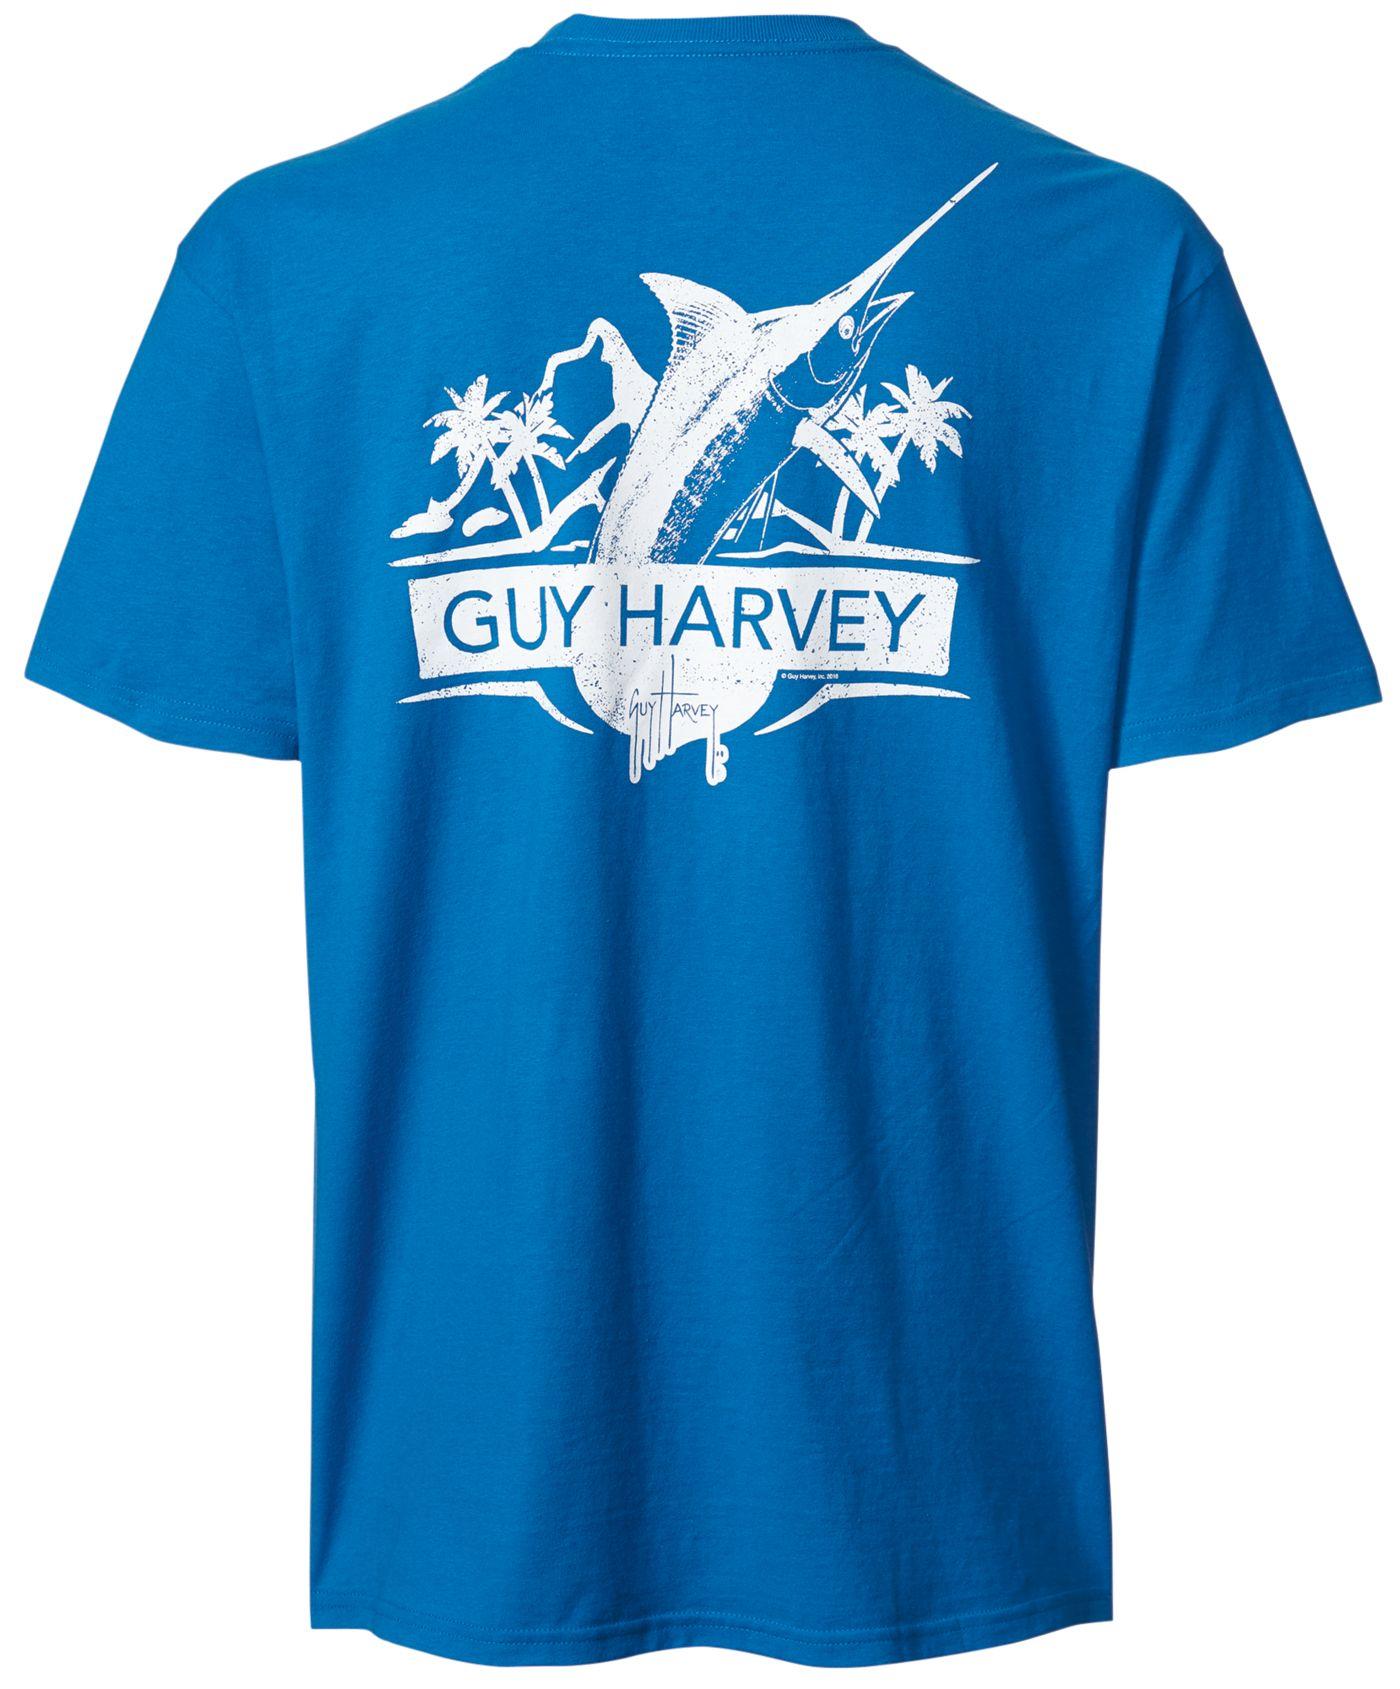 Guy Harvey Men's Warpaint Short Sleeve T-Shirt